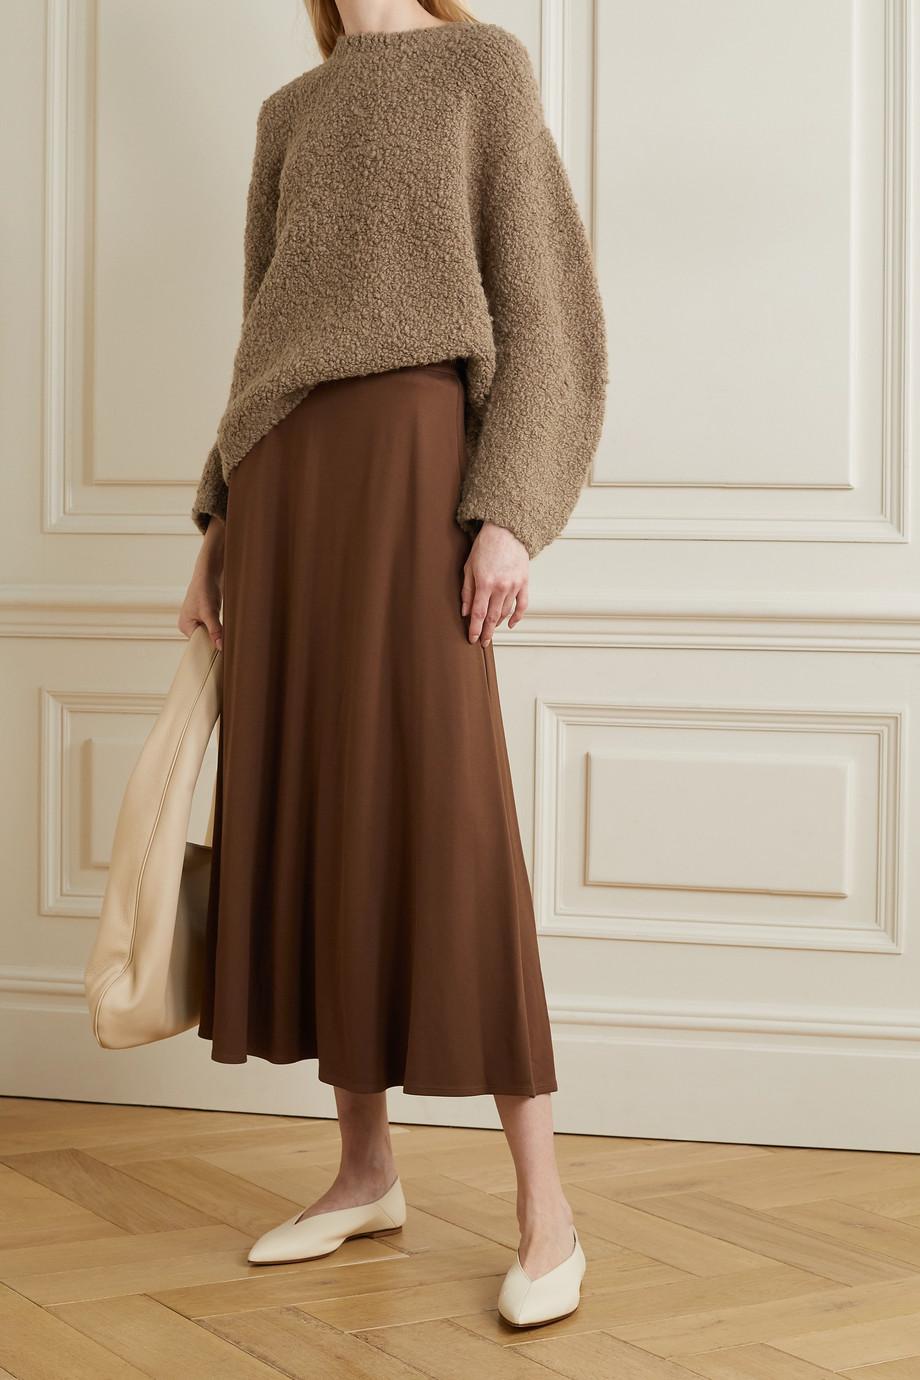 Lauren Manoogian Astrakhan Pullover aus Bouclé aus einer Alpakawoll-Wollmischung